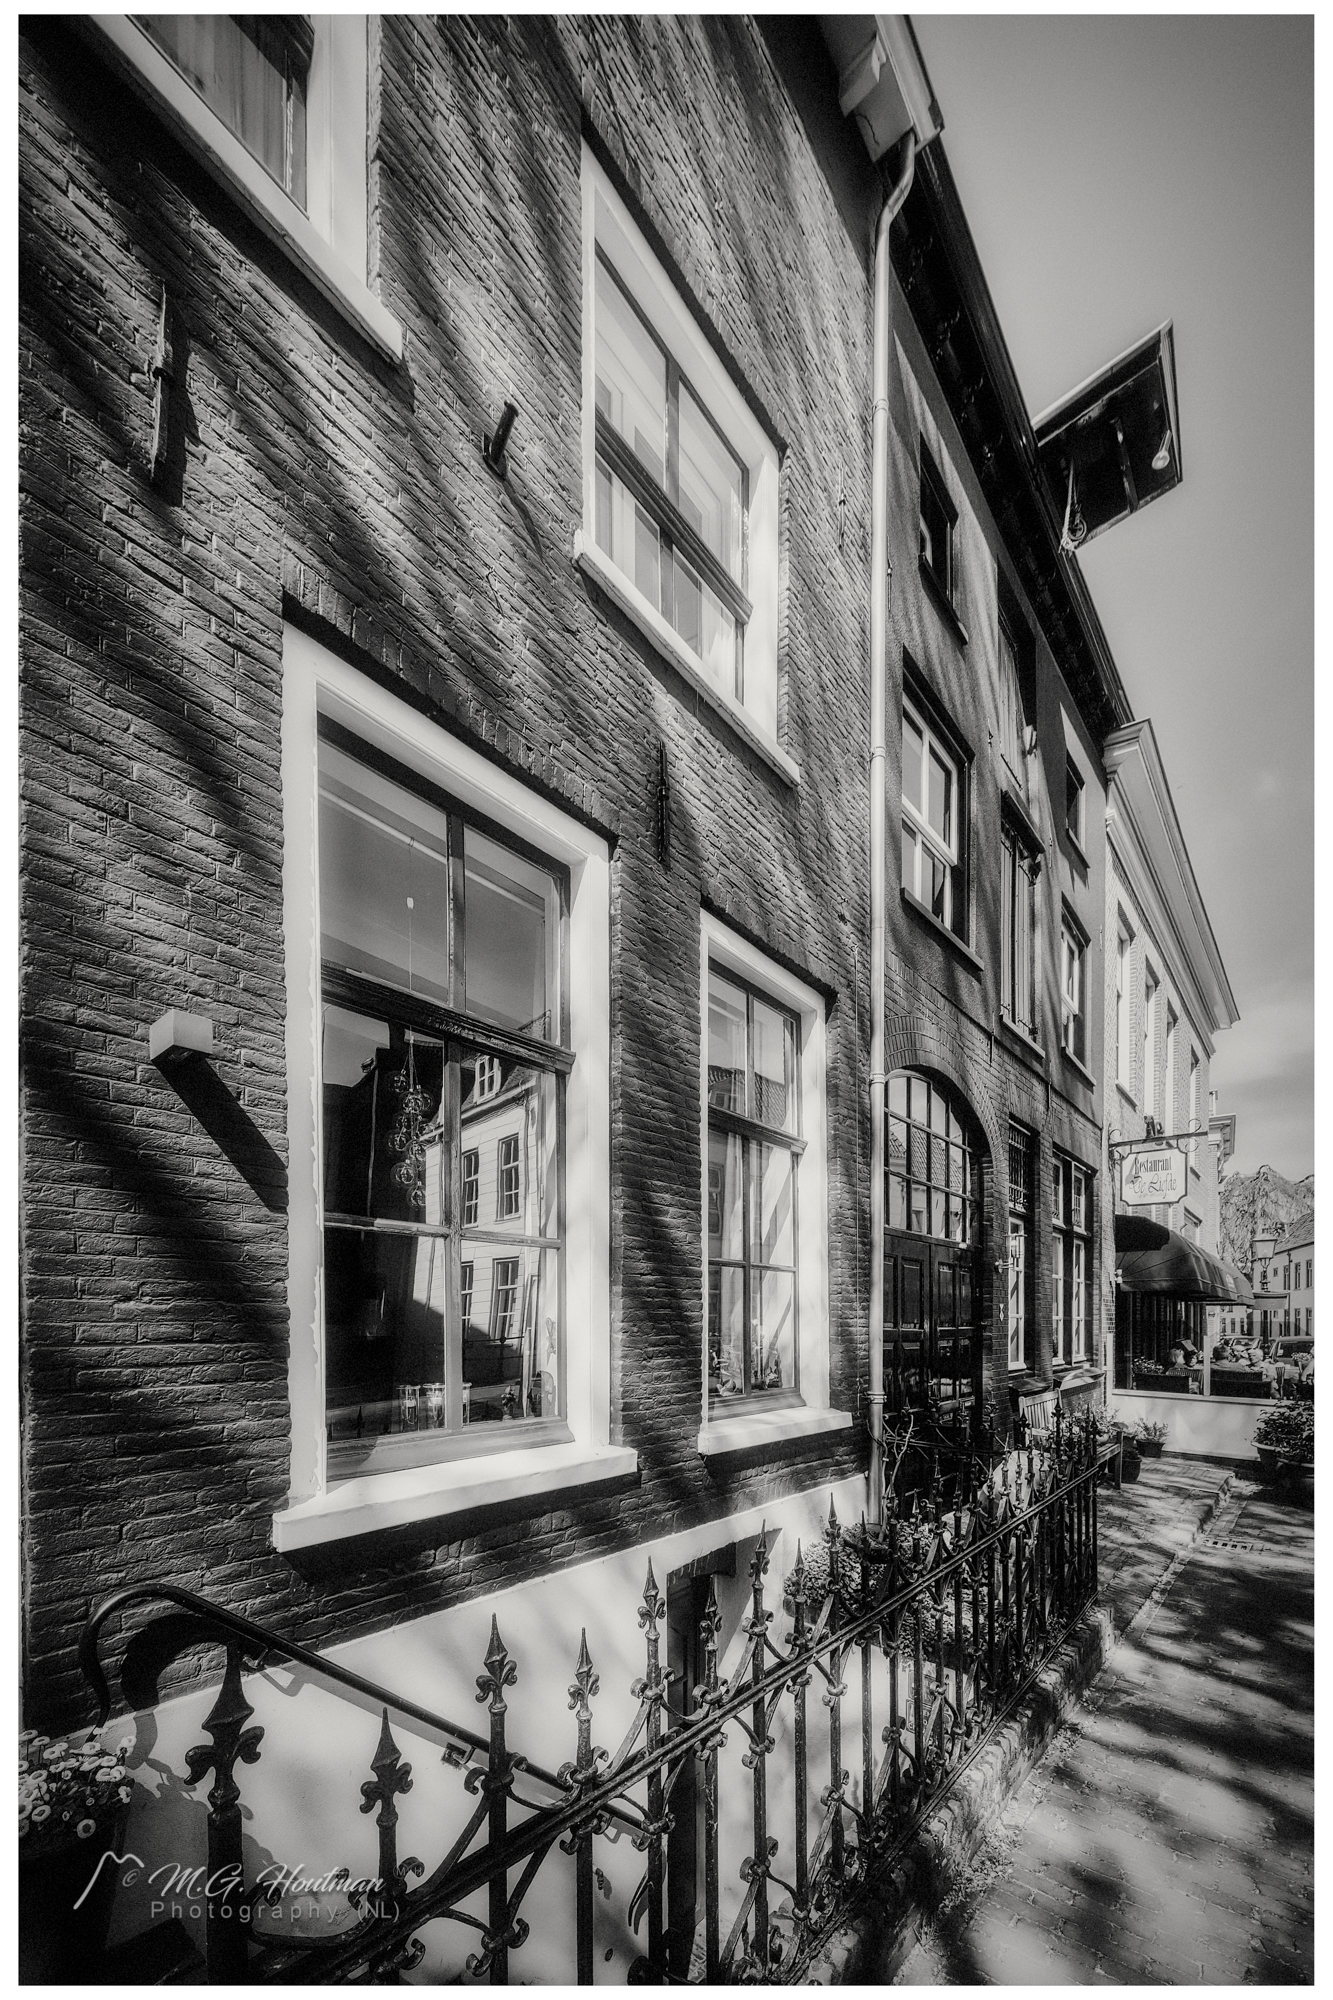 Dutch House facades (NL)